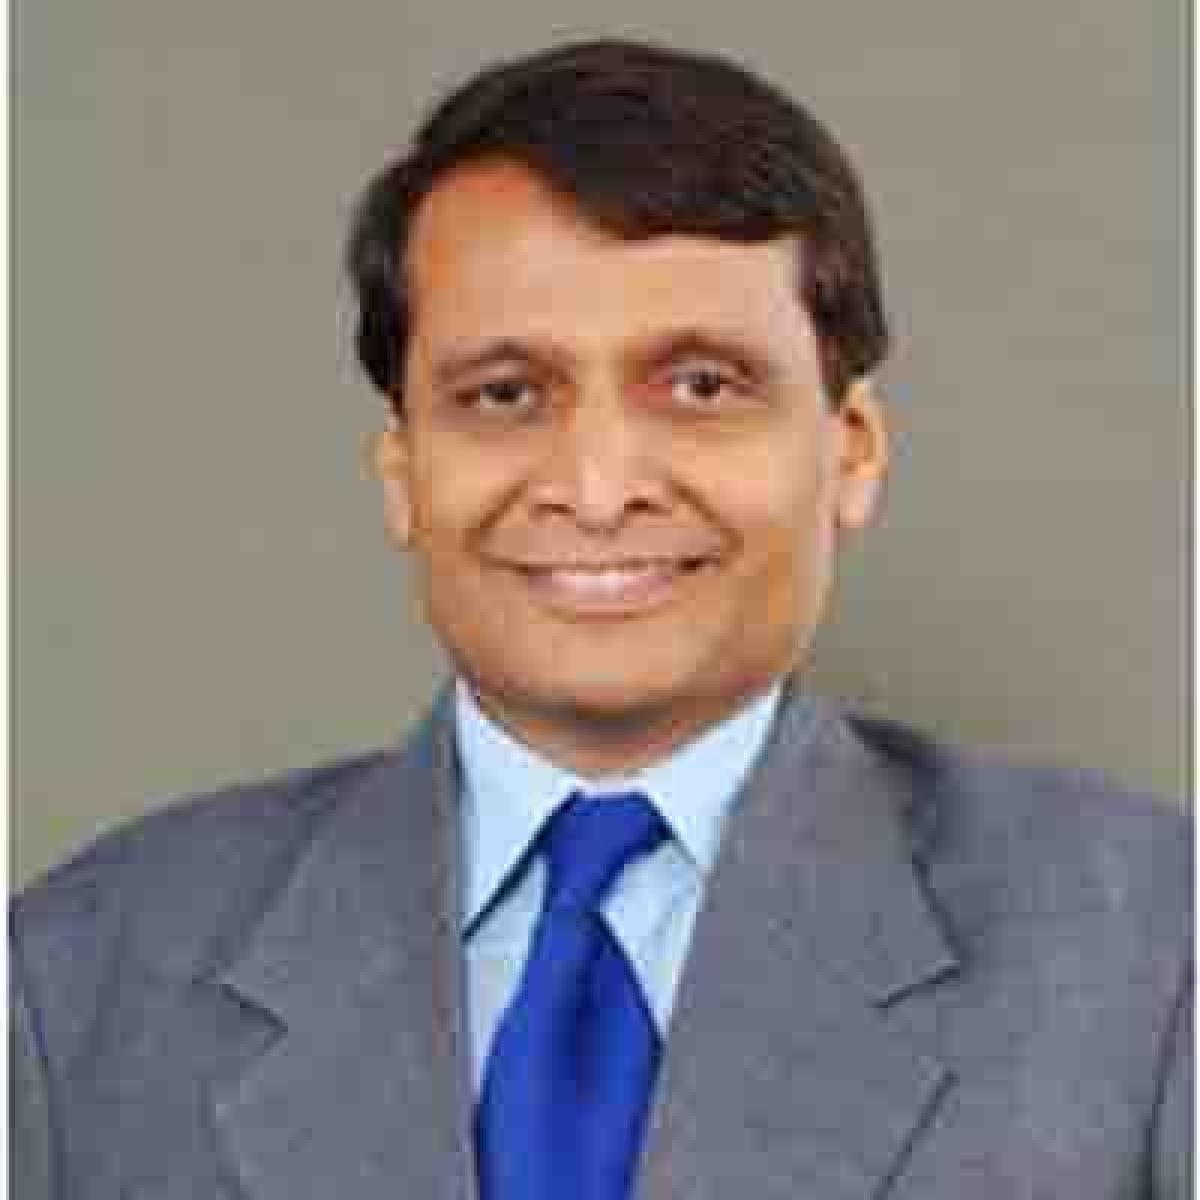 World Bank supports Rlys development fund: Prabhu